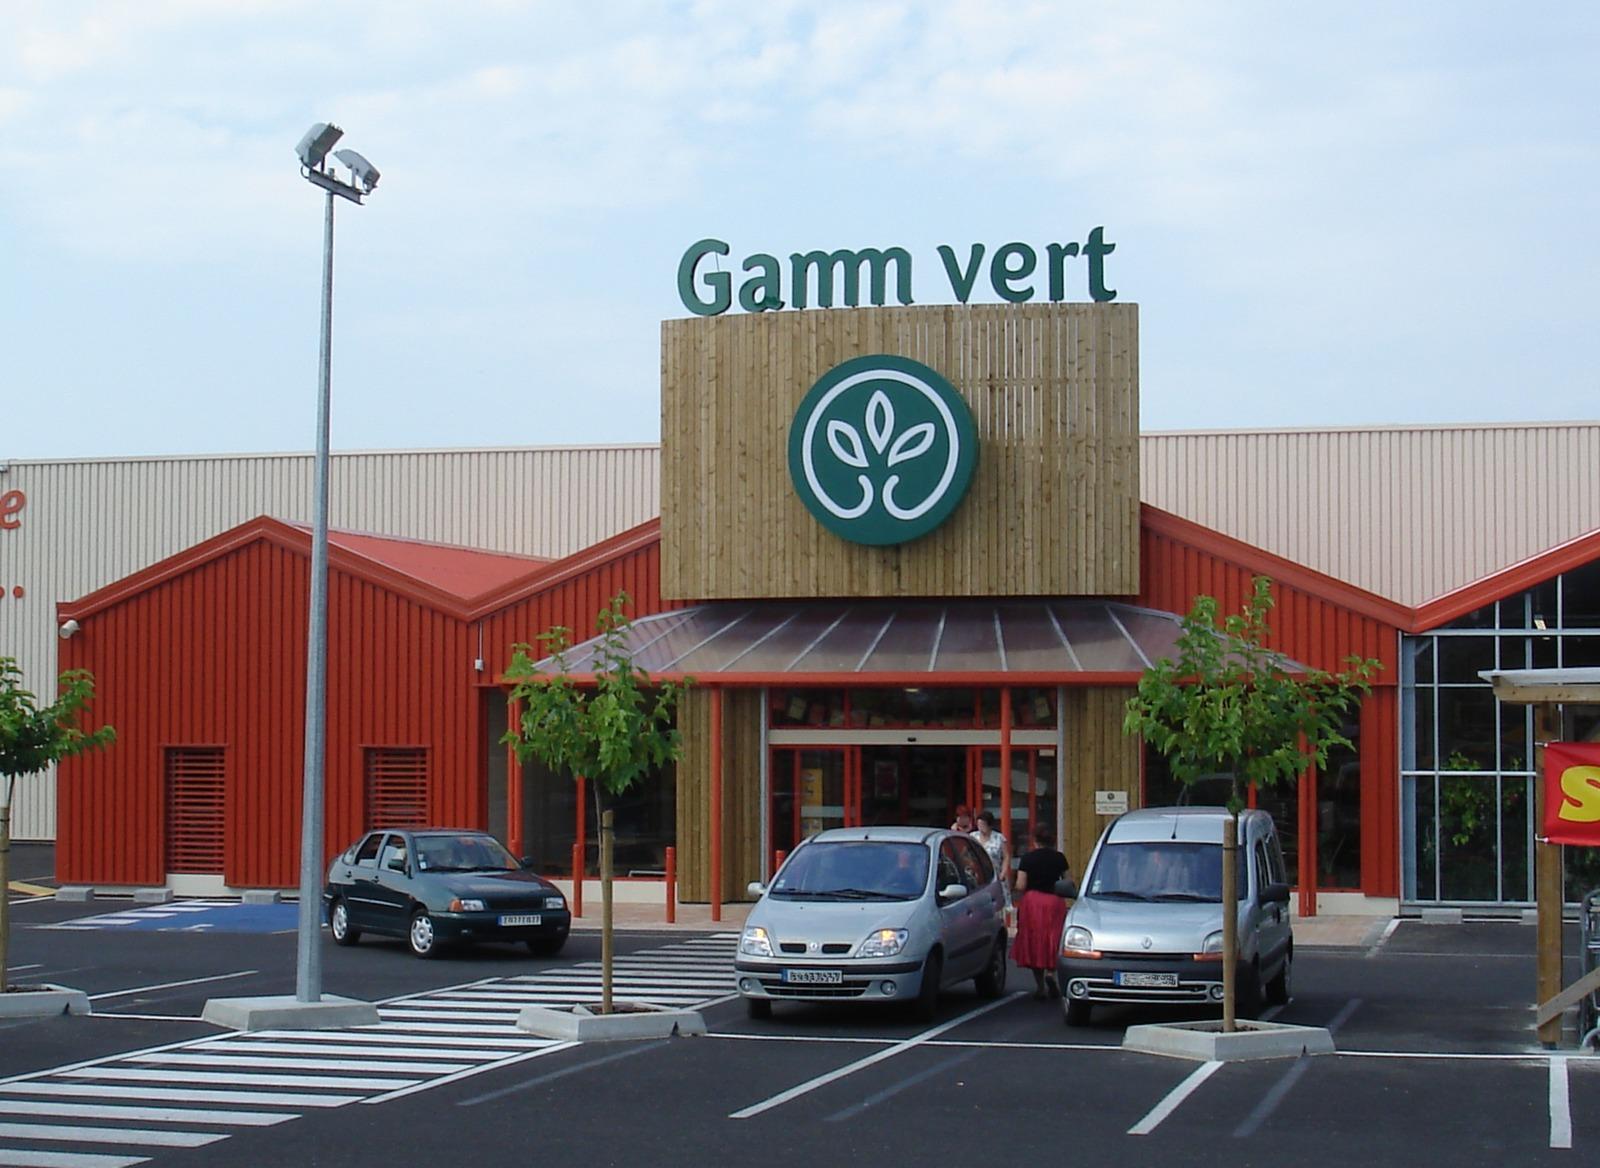 GAMM VERT MARMANDE SUD - MARMANDE - Lot et Garonne